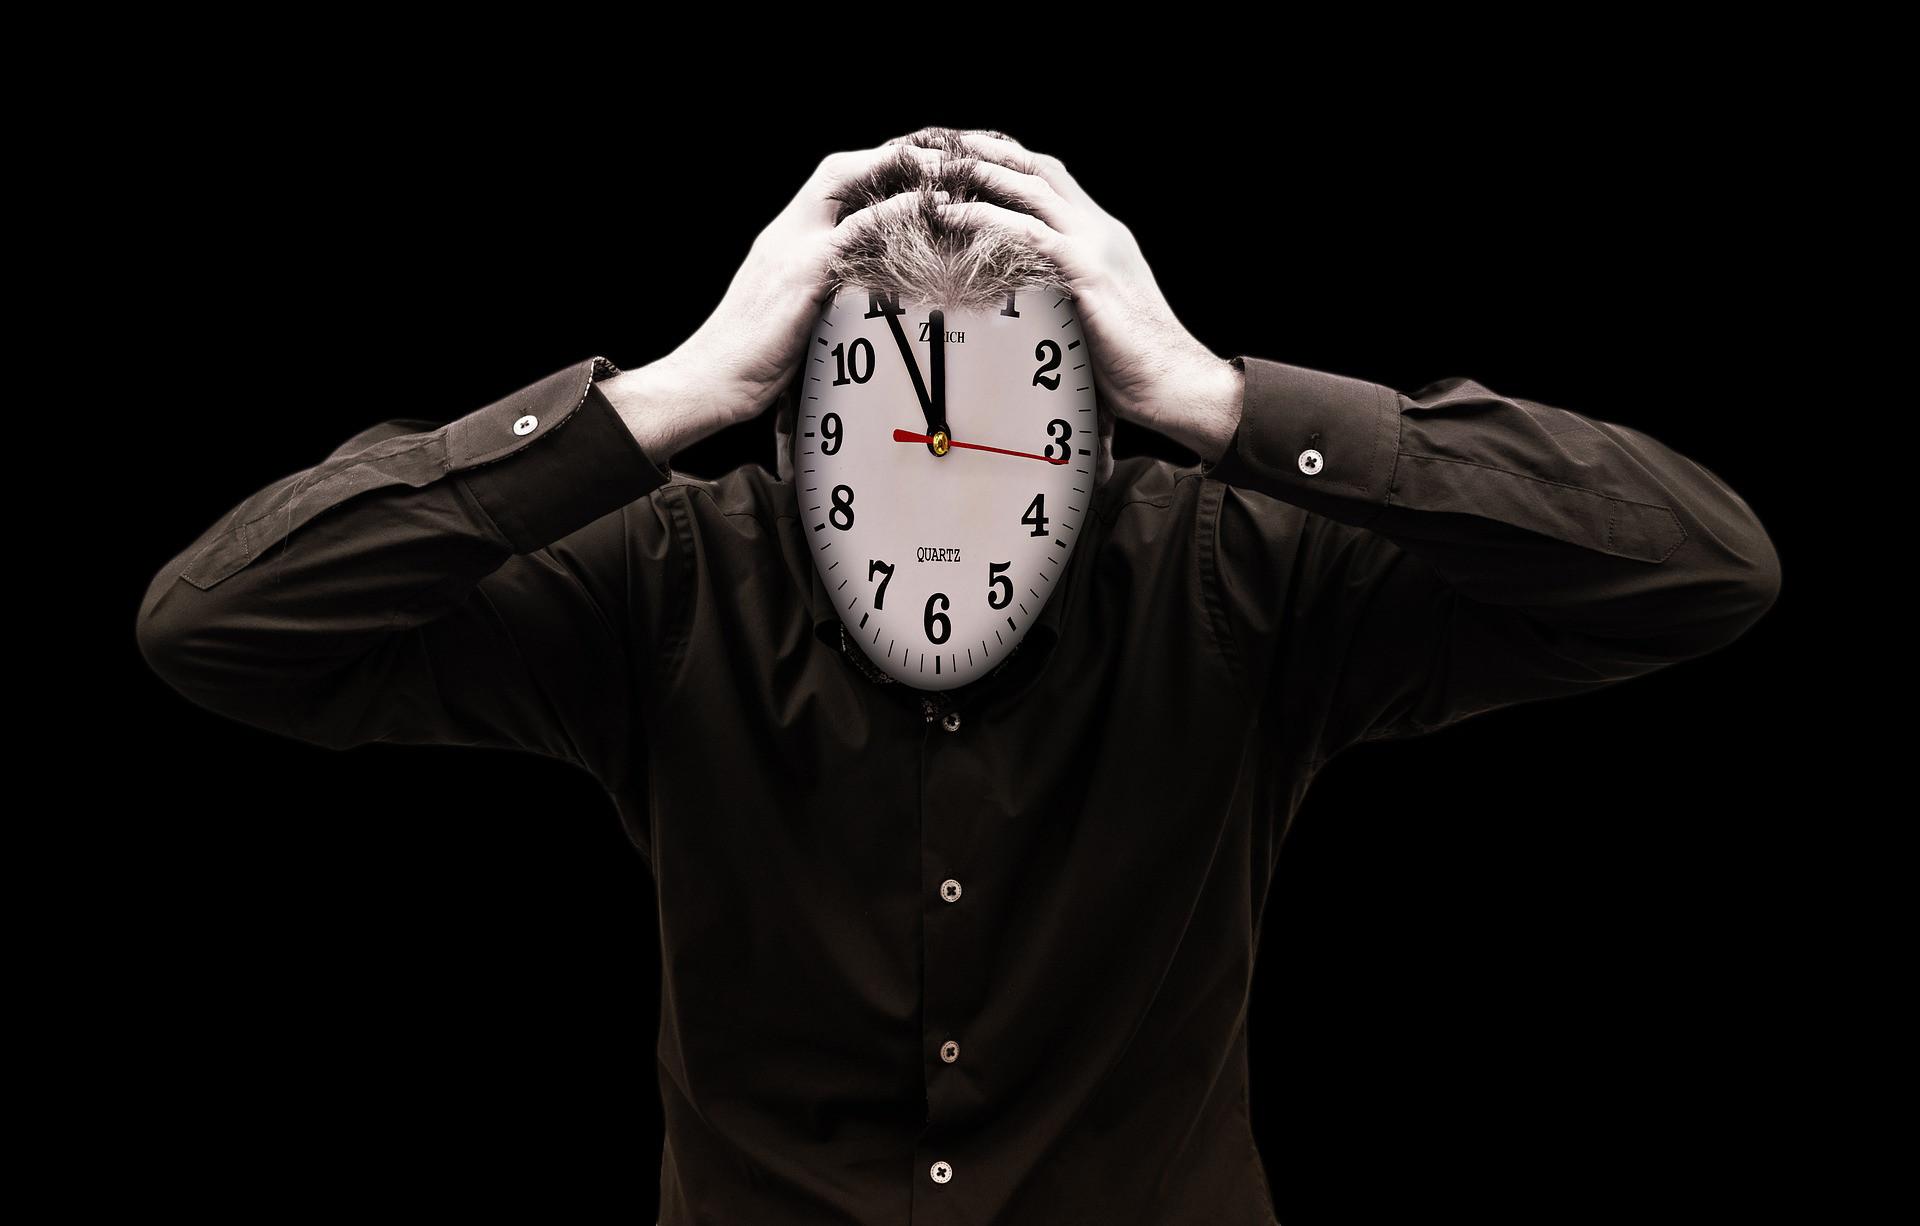 Lentitud frente a ansiedad por la prisa del reloj